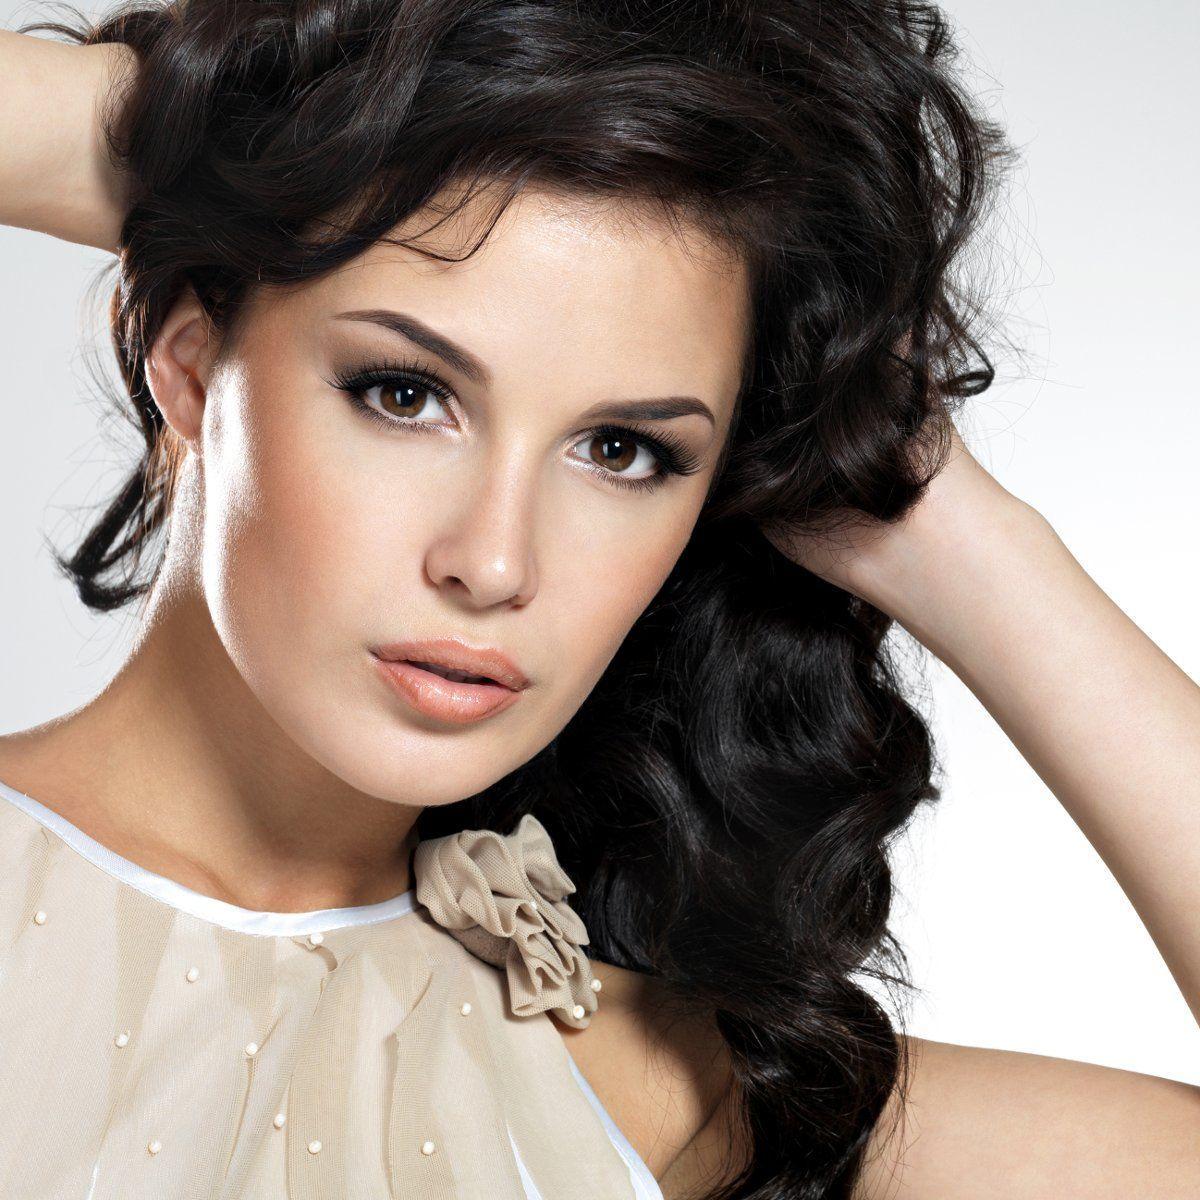 denver wedding hair & makeup - reviews for 219 hair & makeup